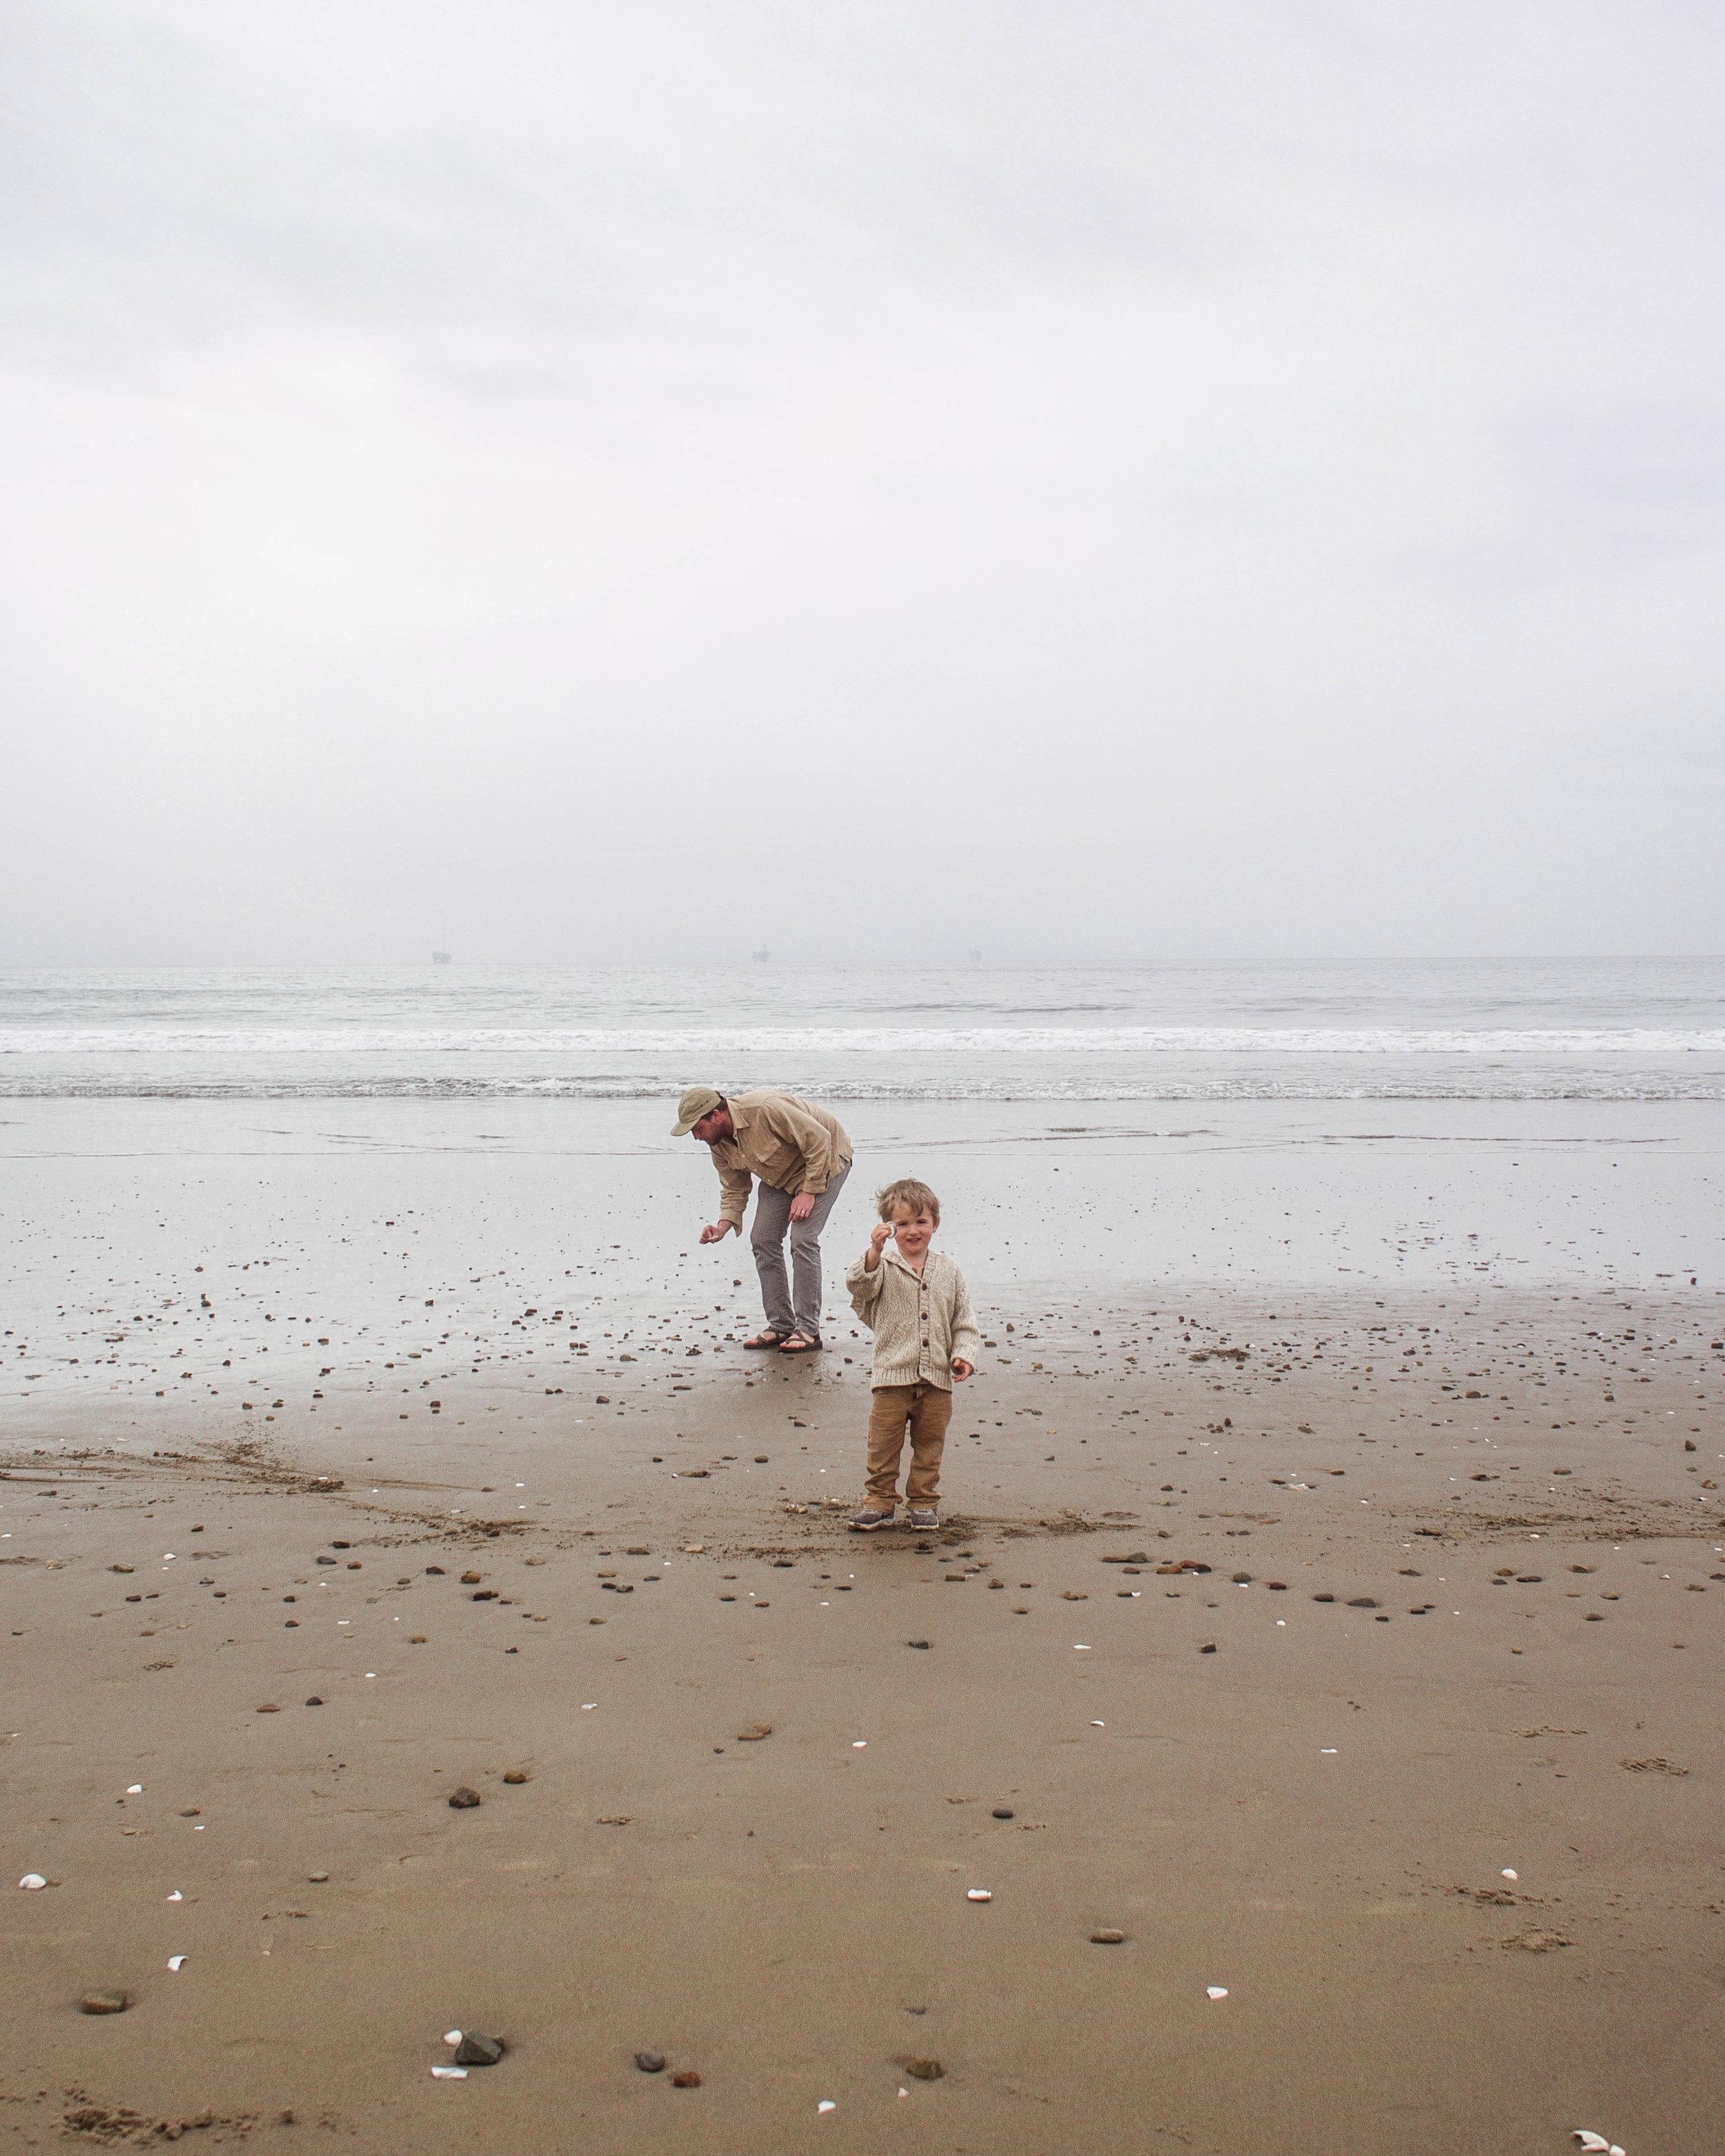 finding sea shells